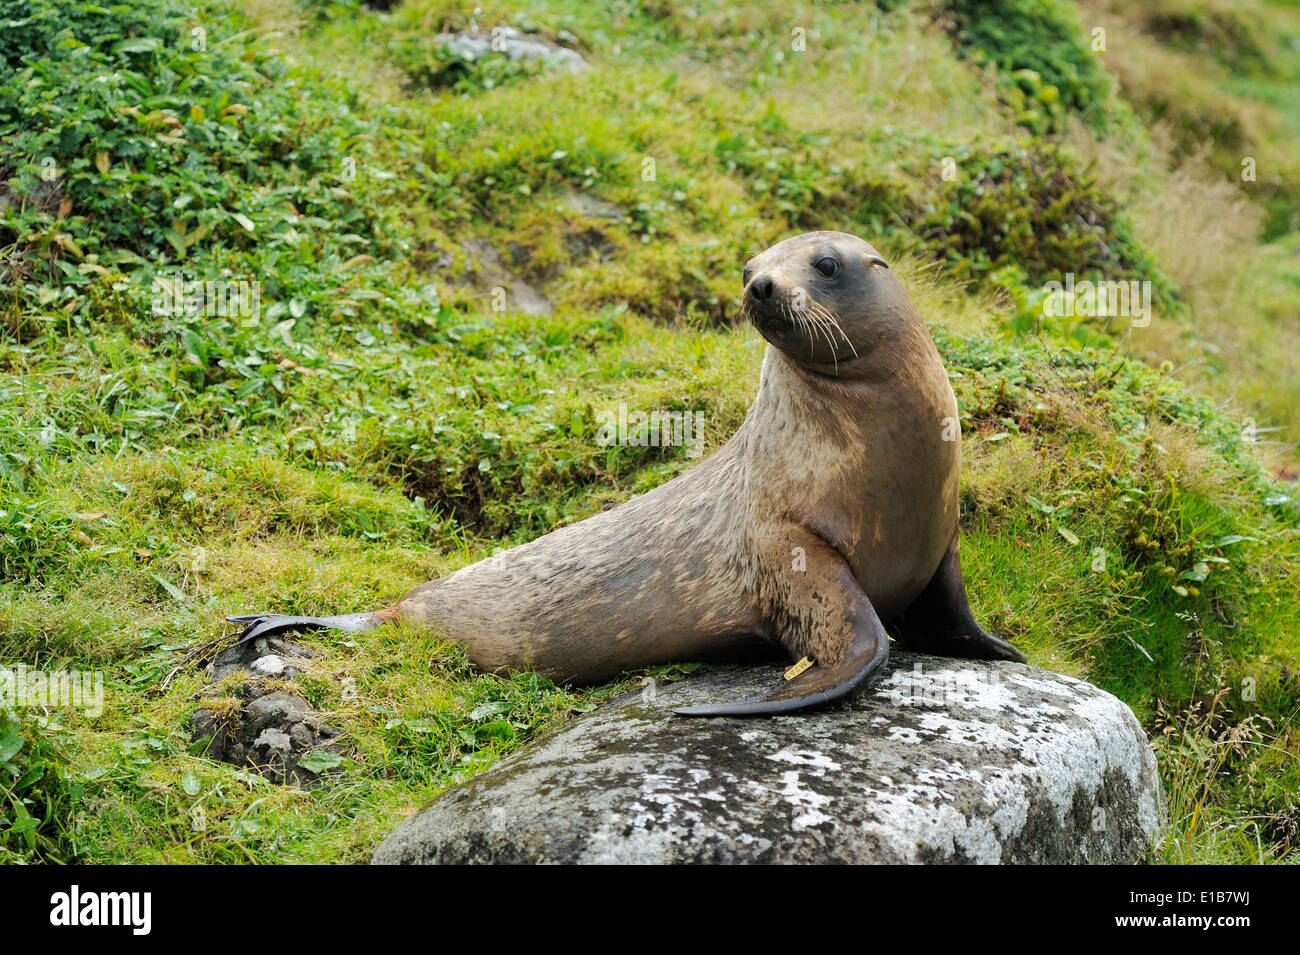 Hooker's Sealion (Phocarctos hookeri) between grass sitting on a rock. - Stock Image